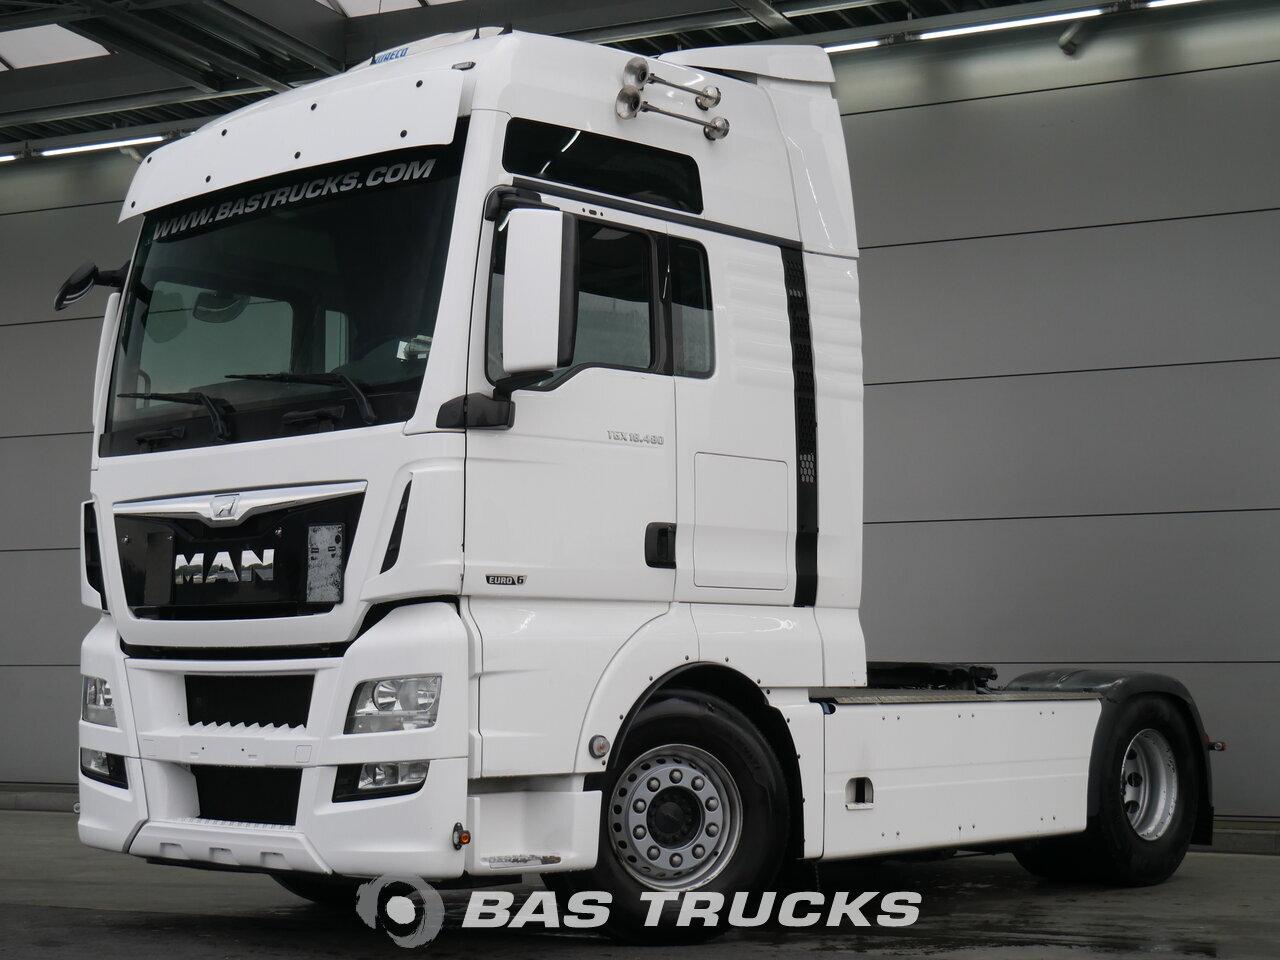 man tgx xxl tracteur euro 6 38800 bas trucks. Black Bedroom Furniture Sets. Home Design Ideas